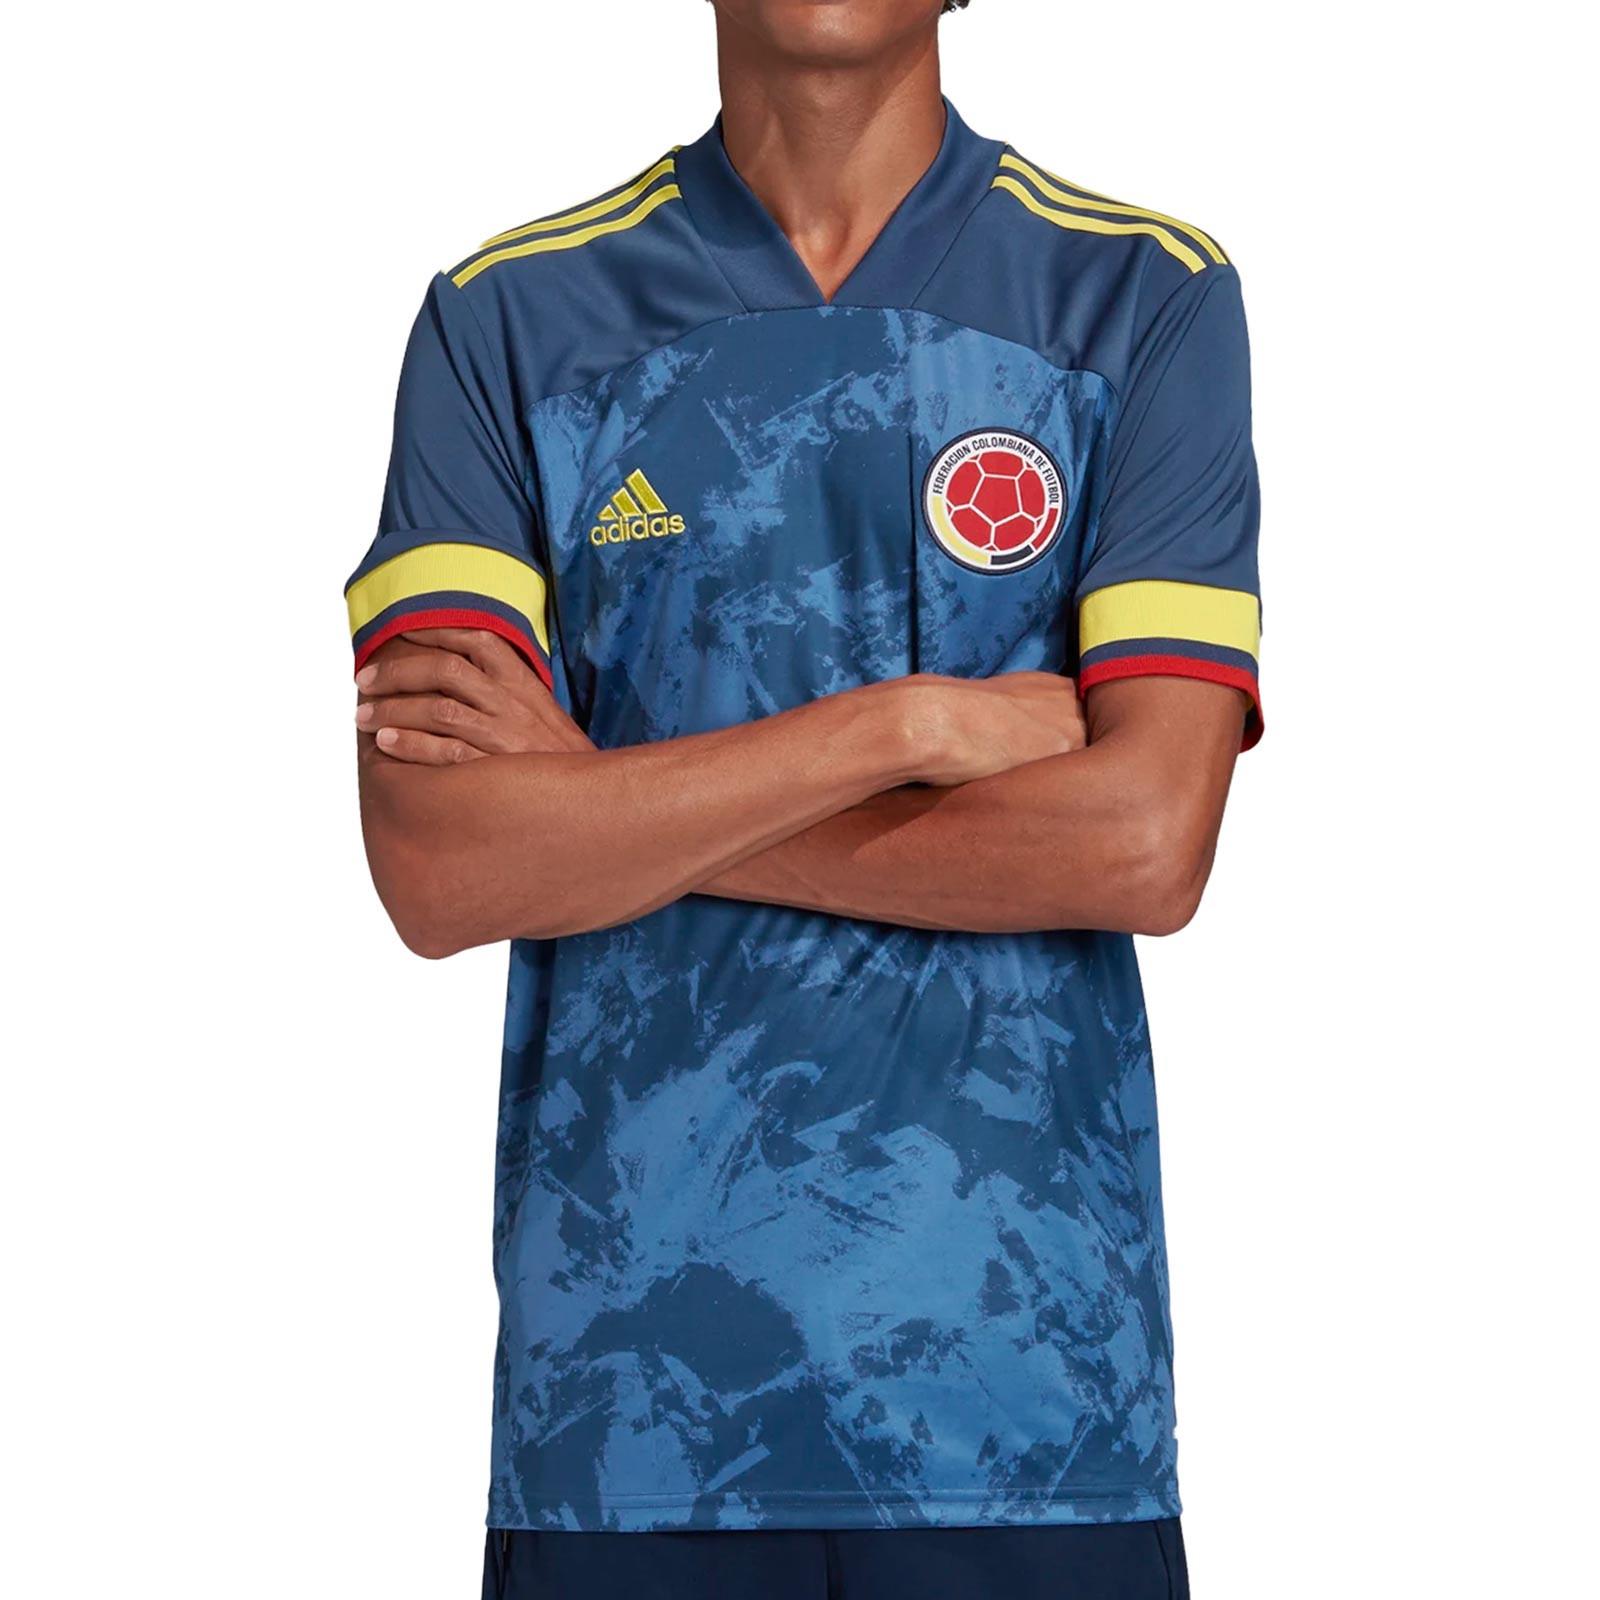 ganador Ewell Gimnasio  Camiseta adidas 2a Colombia 2020 2021 azul marino | futbolmania